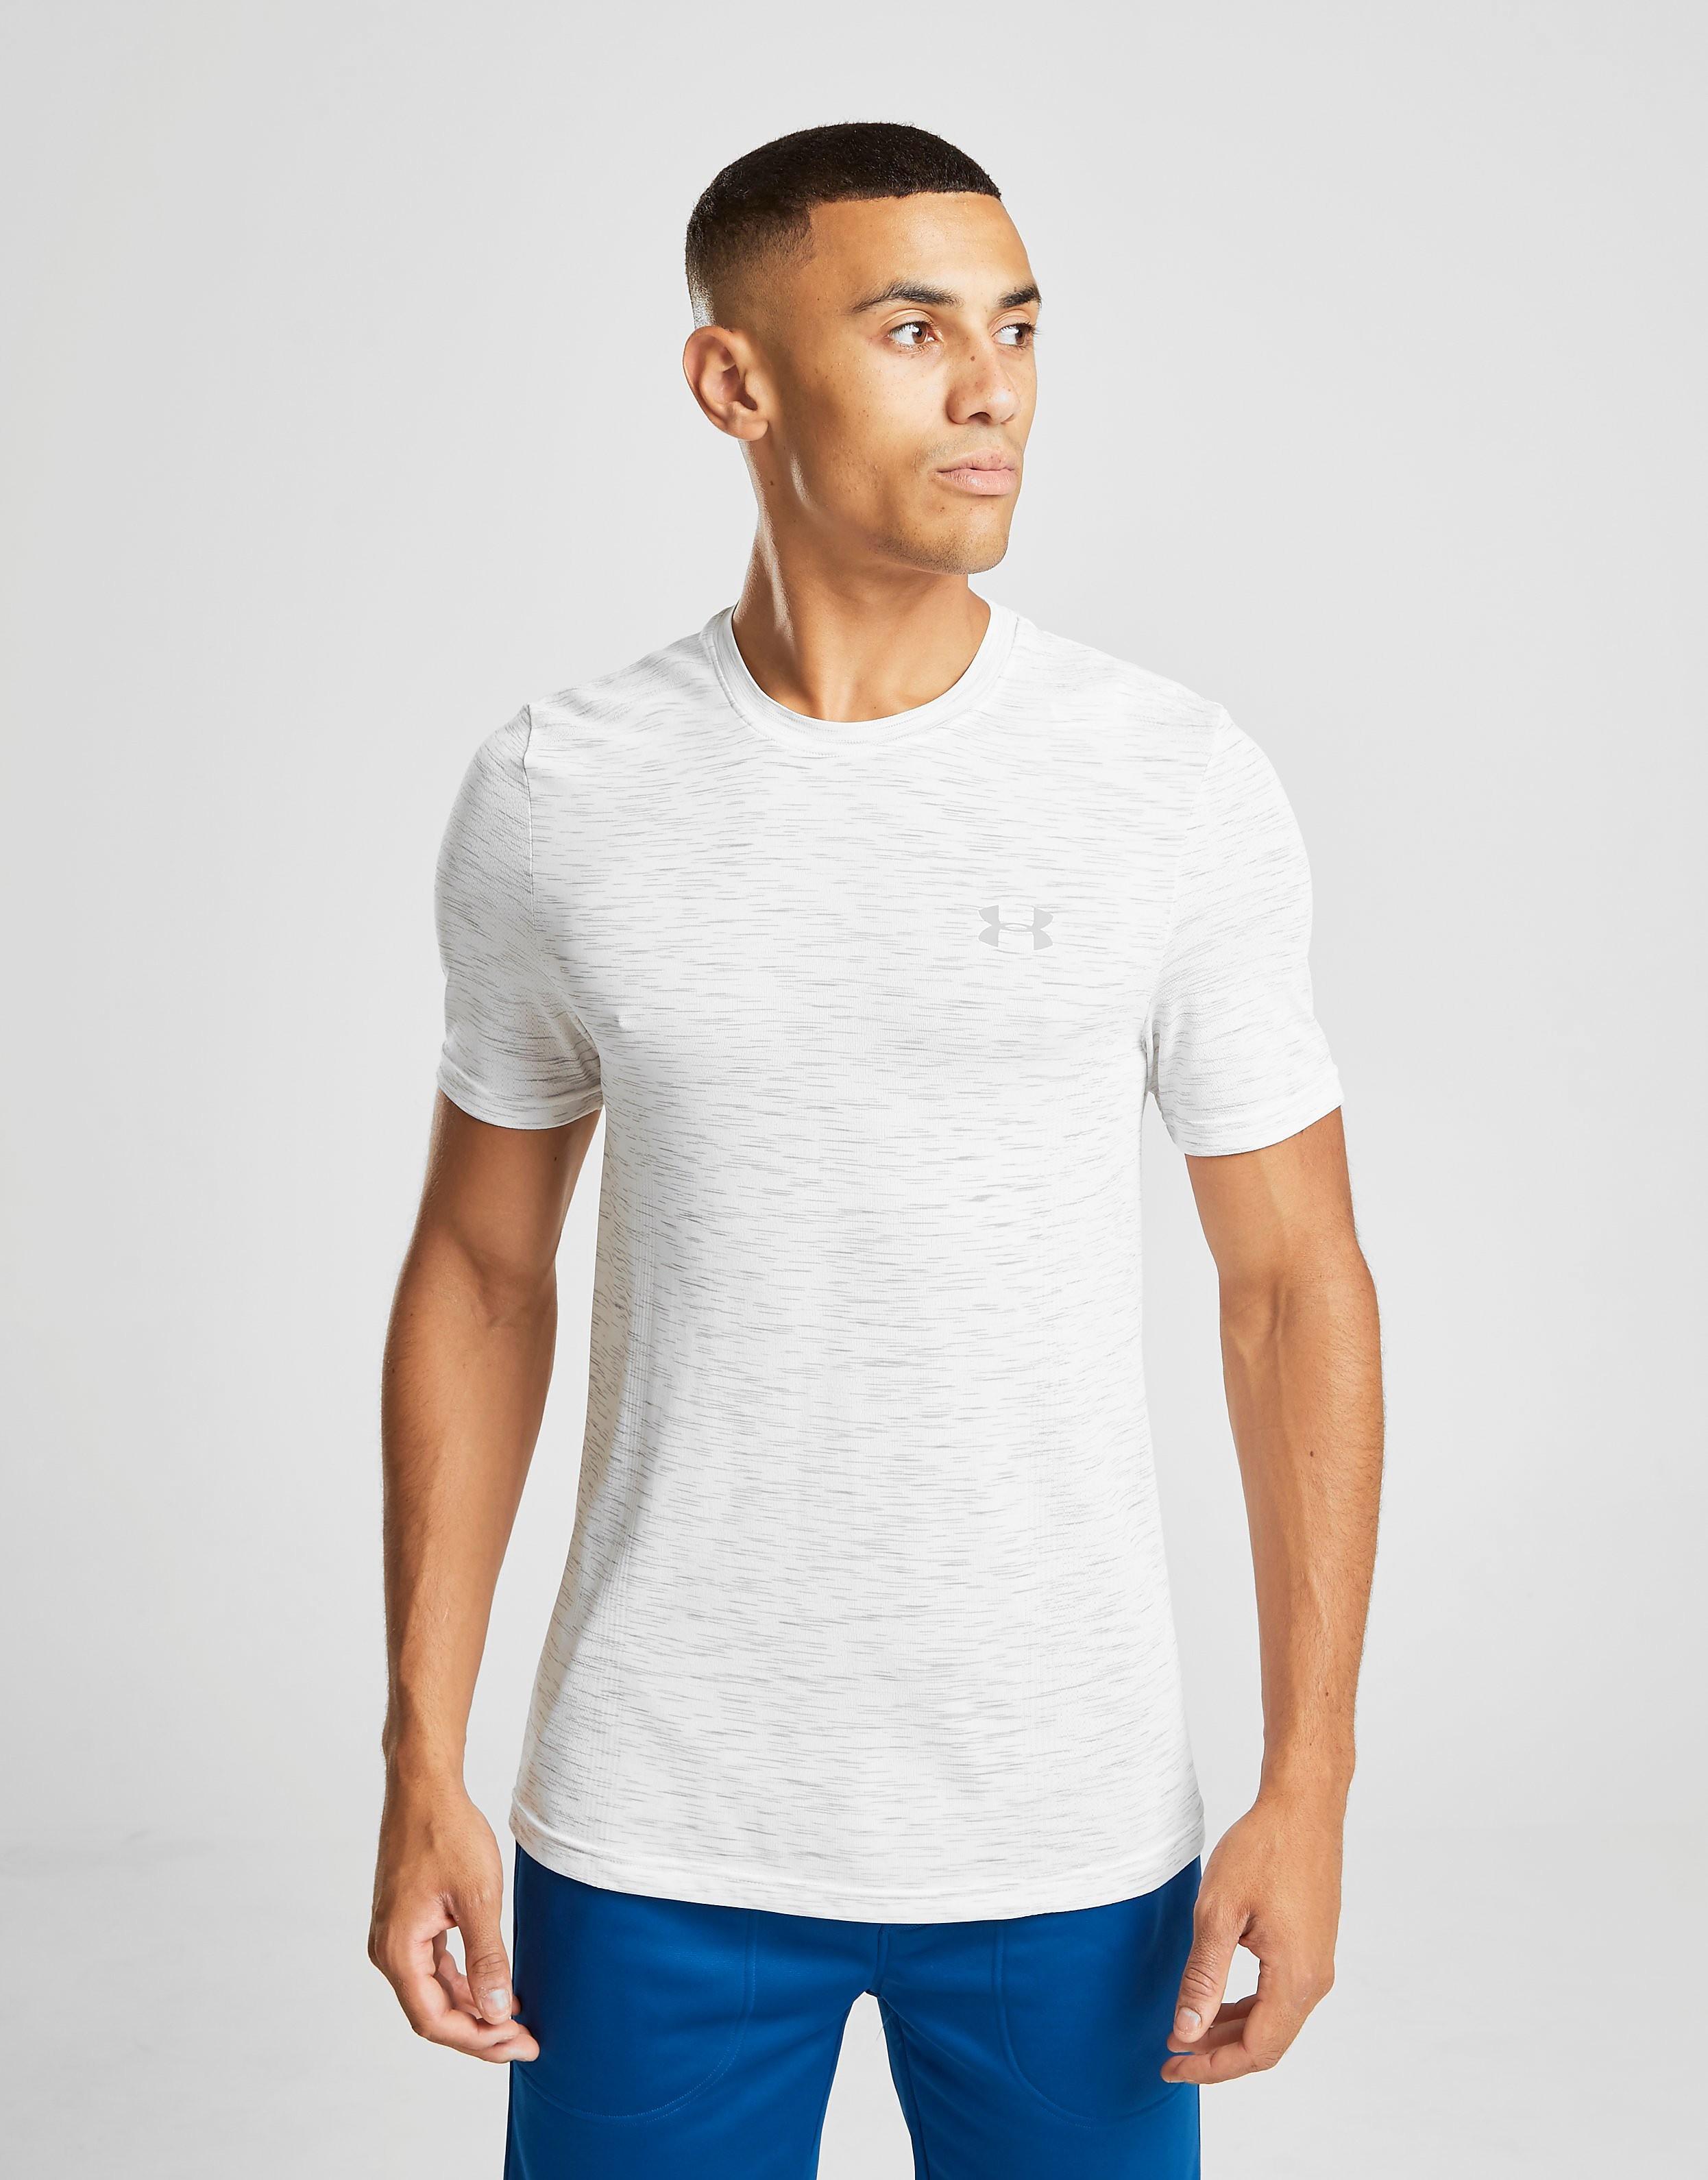 Under Armour Threadborne Seamless T-Shirt